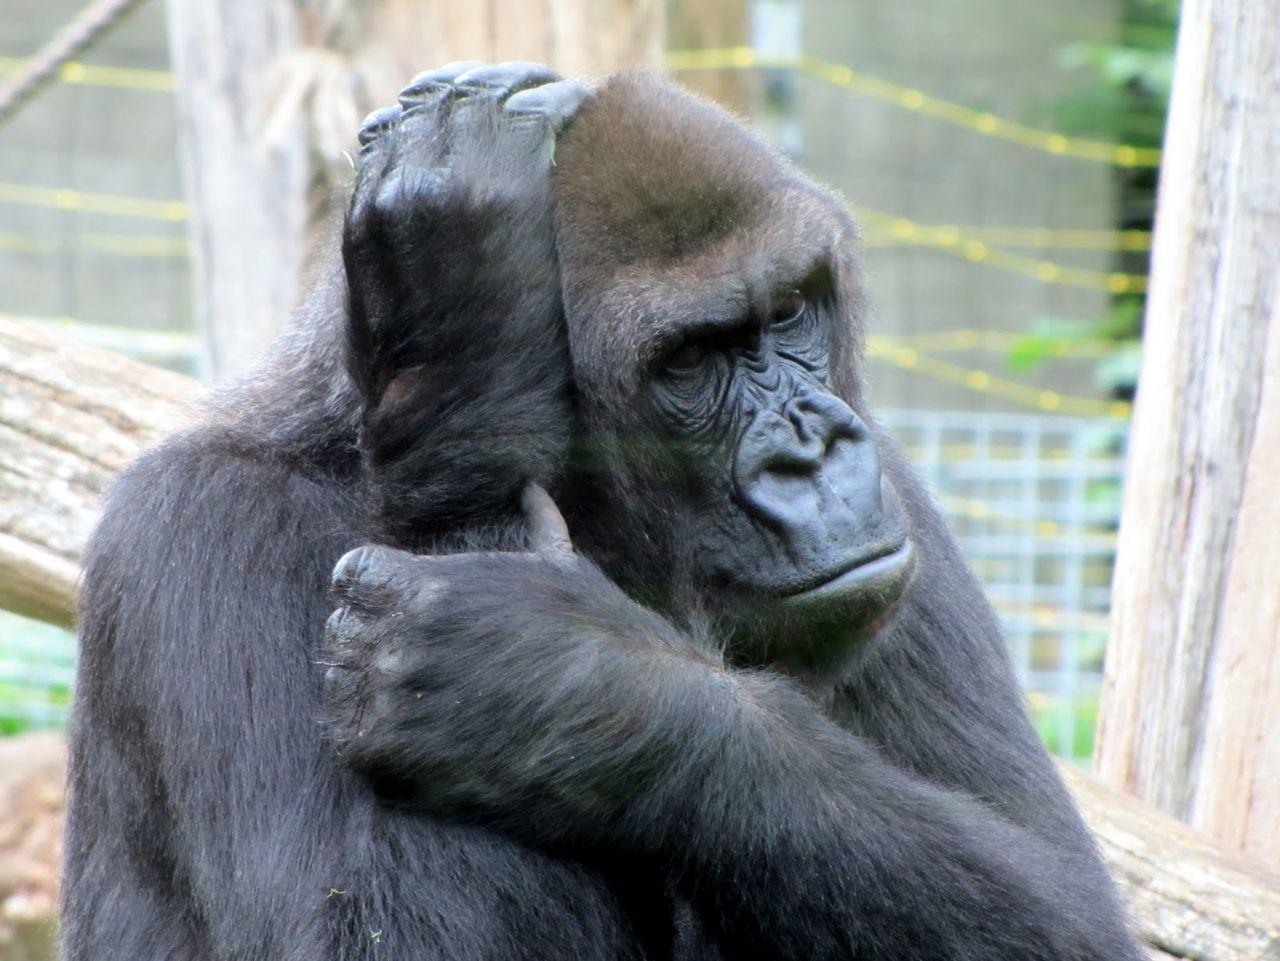 Animal Themes Animal Wildlife Animals In The Wild Ape Chimpanzee Close-up Day Gorilla Mammal Monkey Nature No People One Animal Orangutan Outdoors Primate Zoo